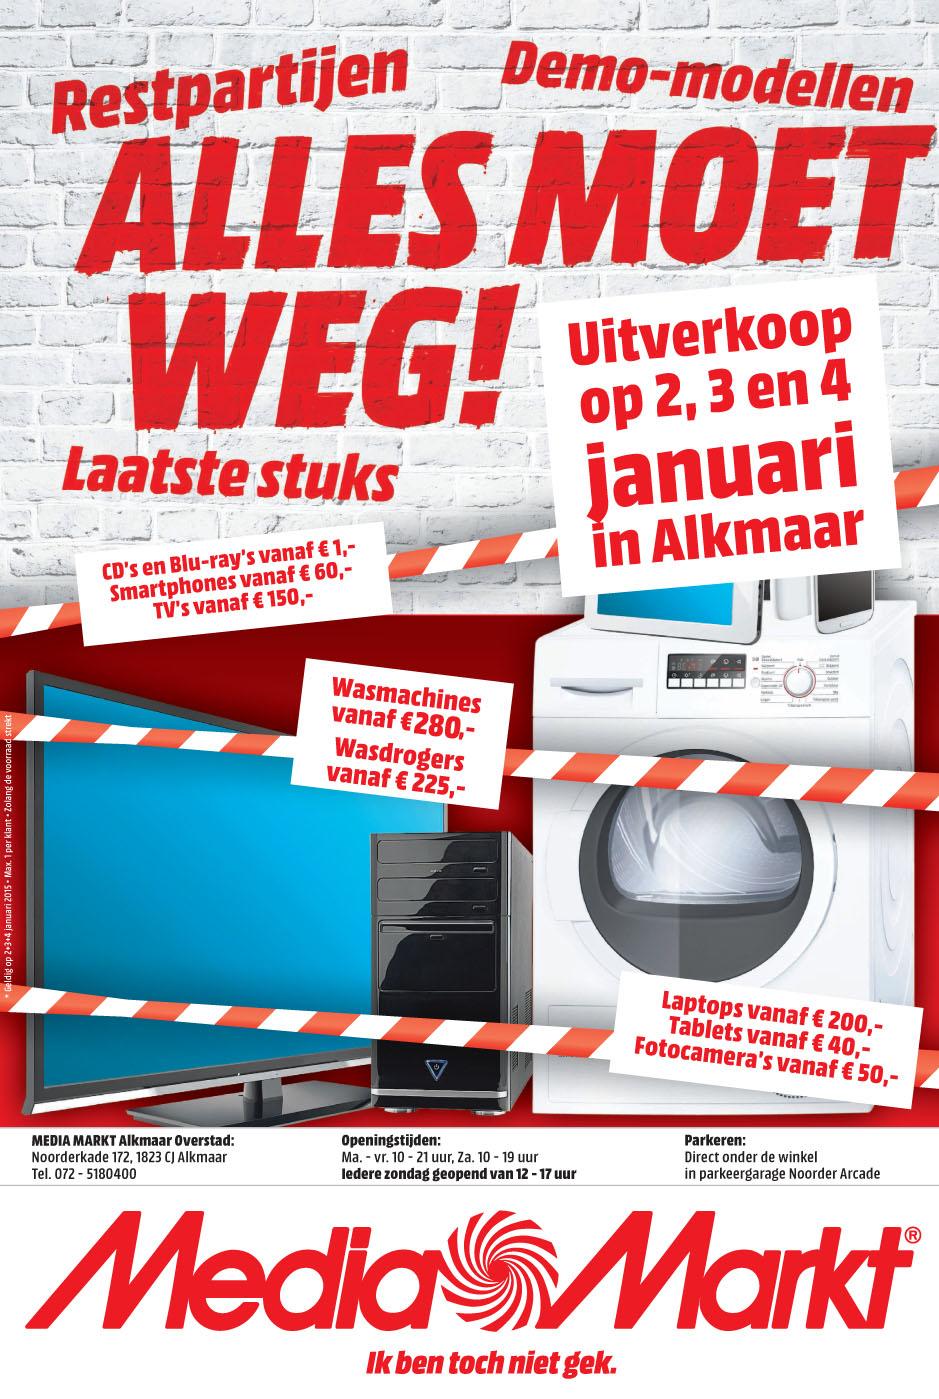 Opruiming restpartijen en demo-modellen @ Media Markt Alkmaar